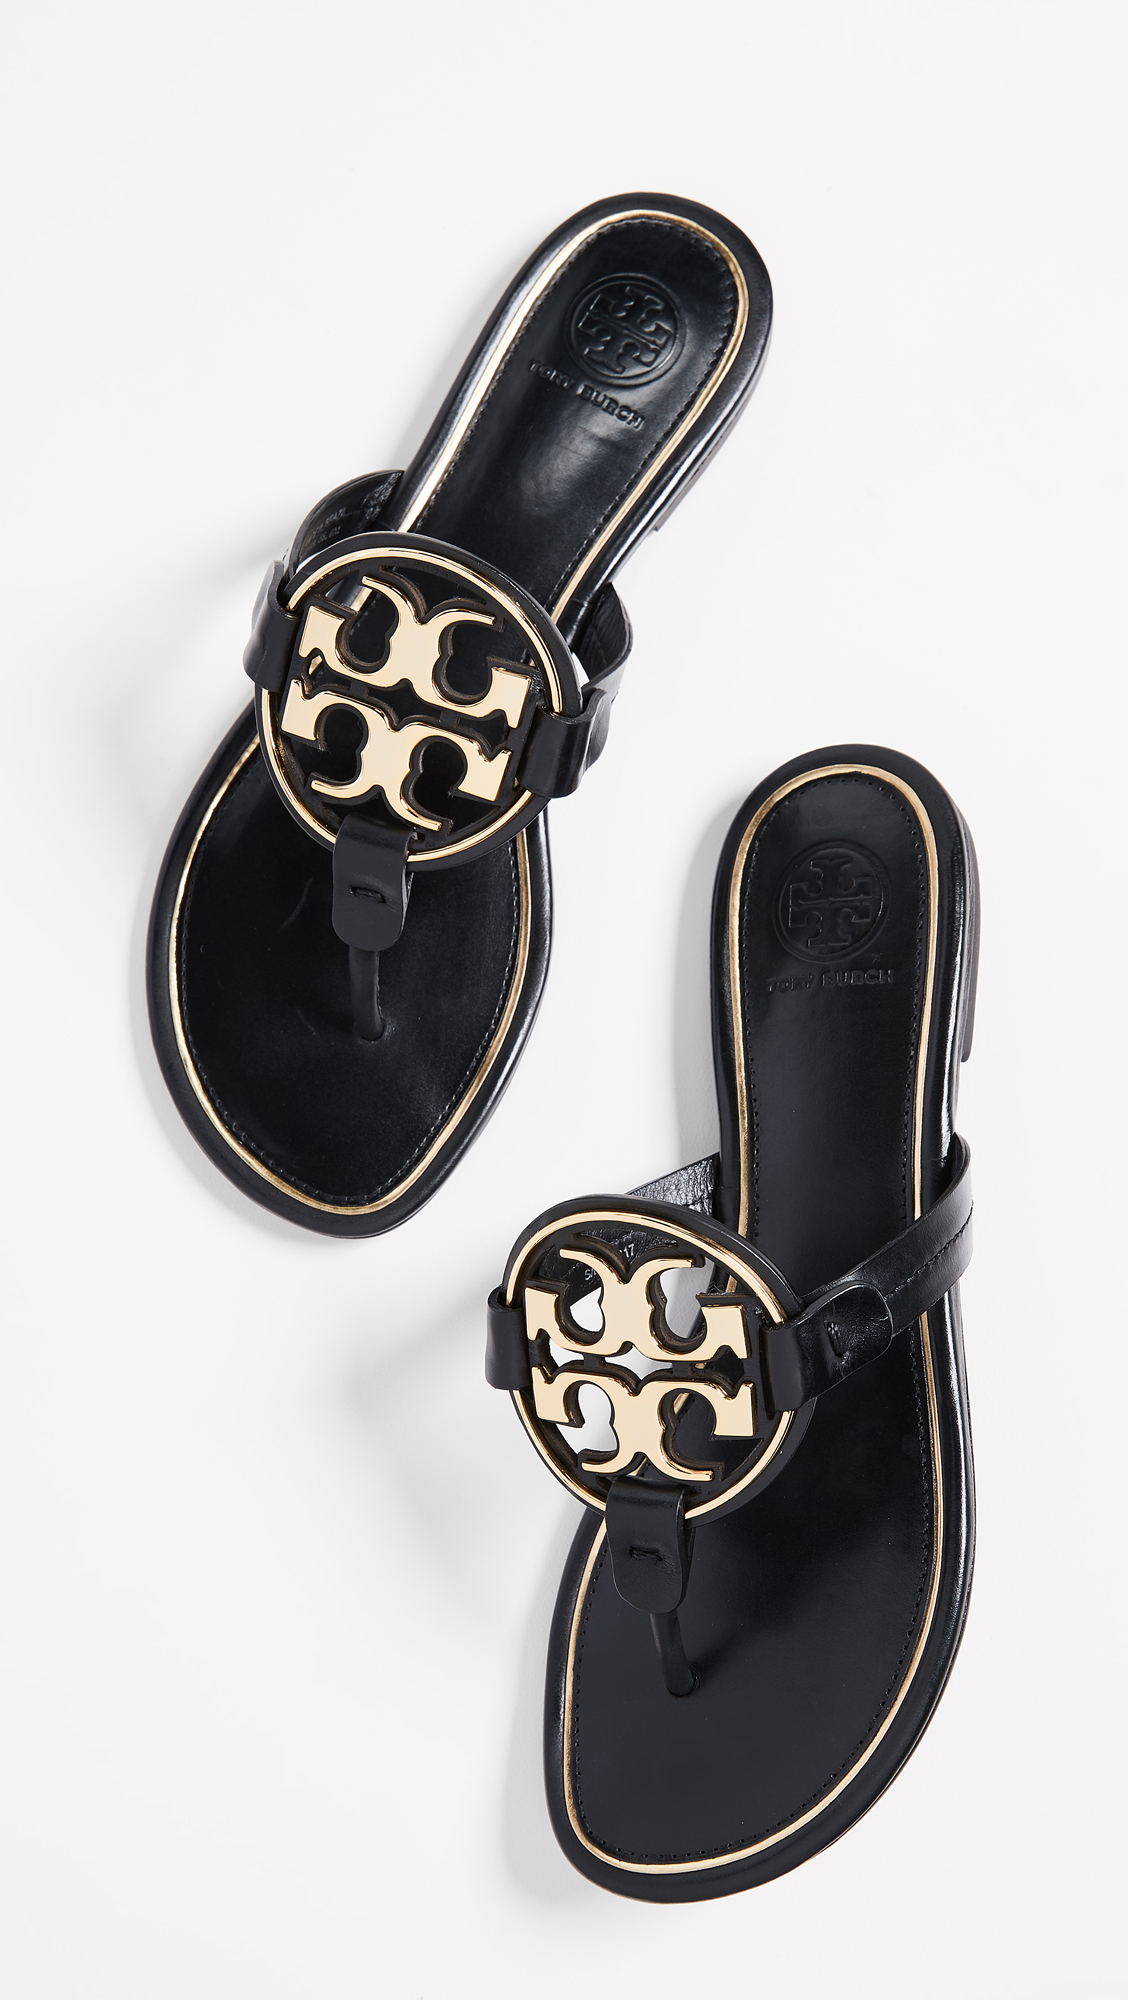 da74296ddfbc43 Tory Burch Miller Metal Thong Sandals